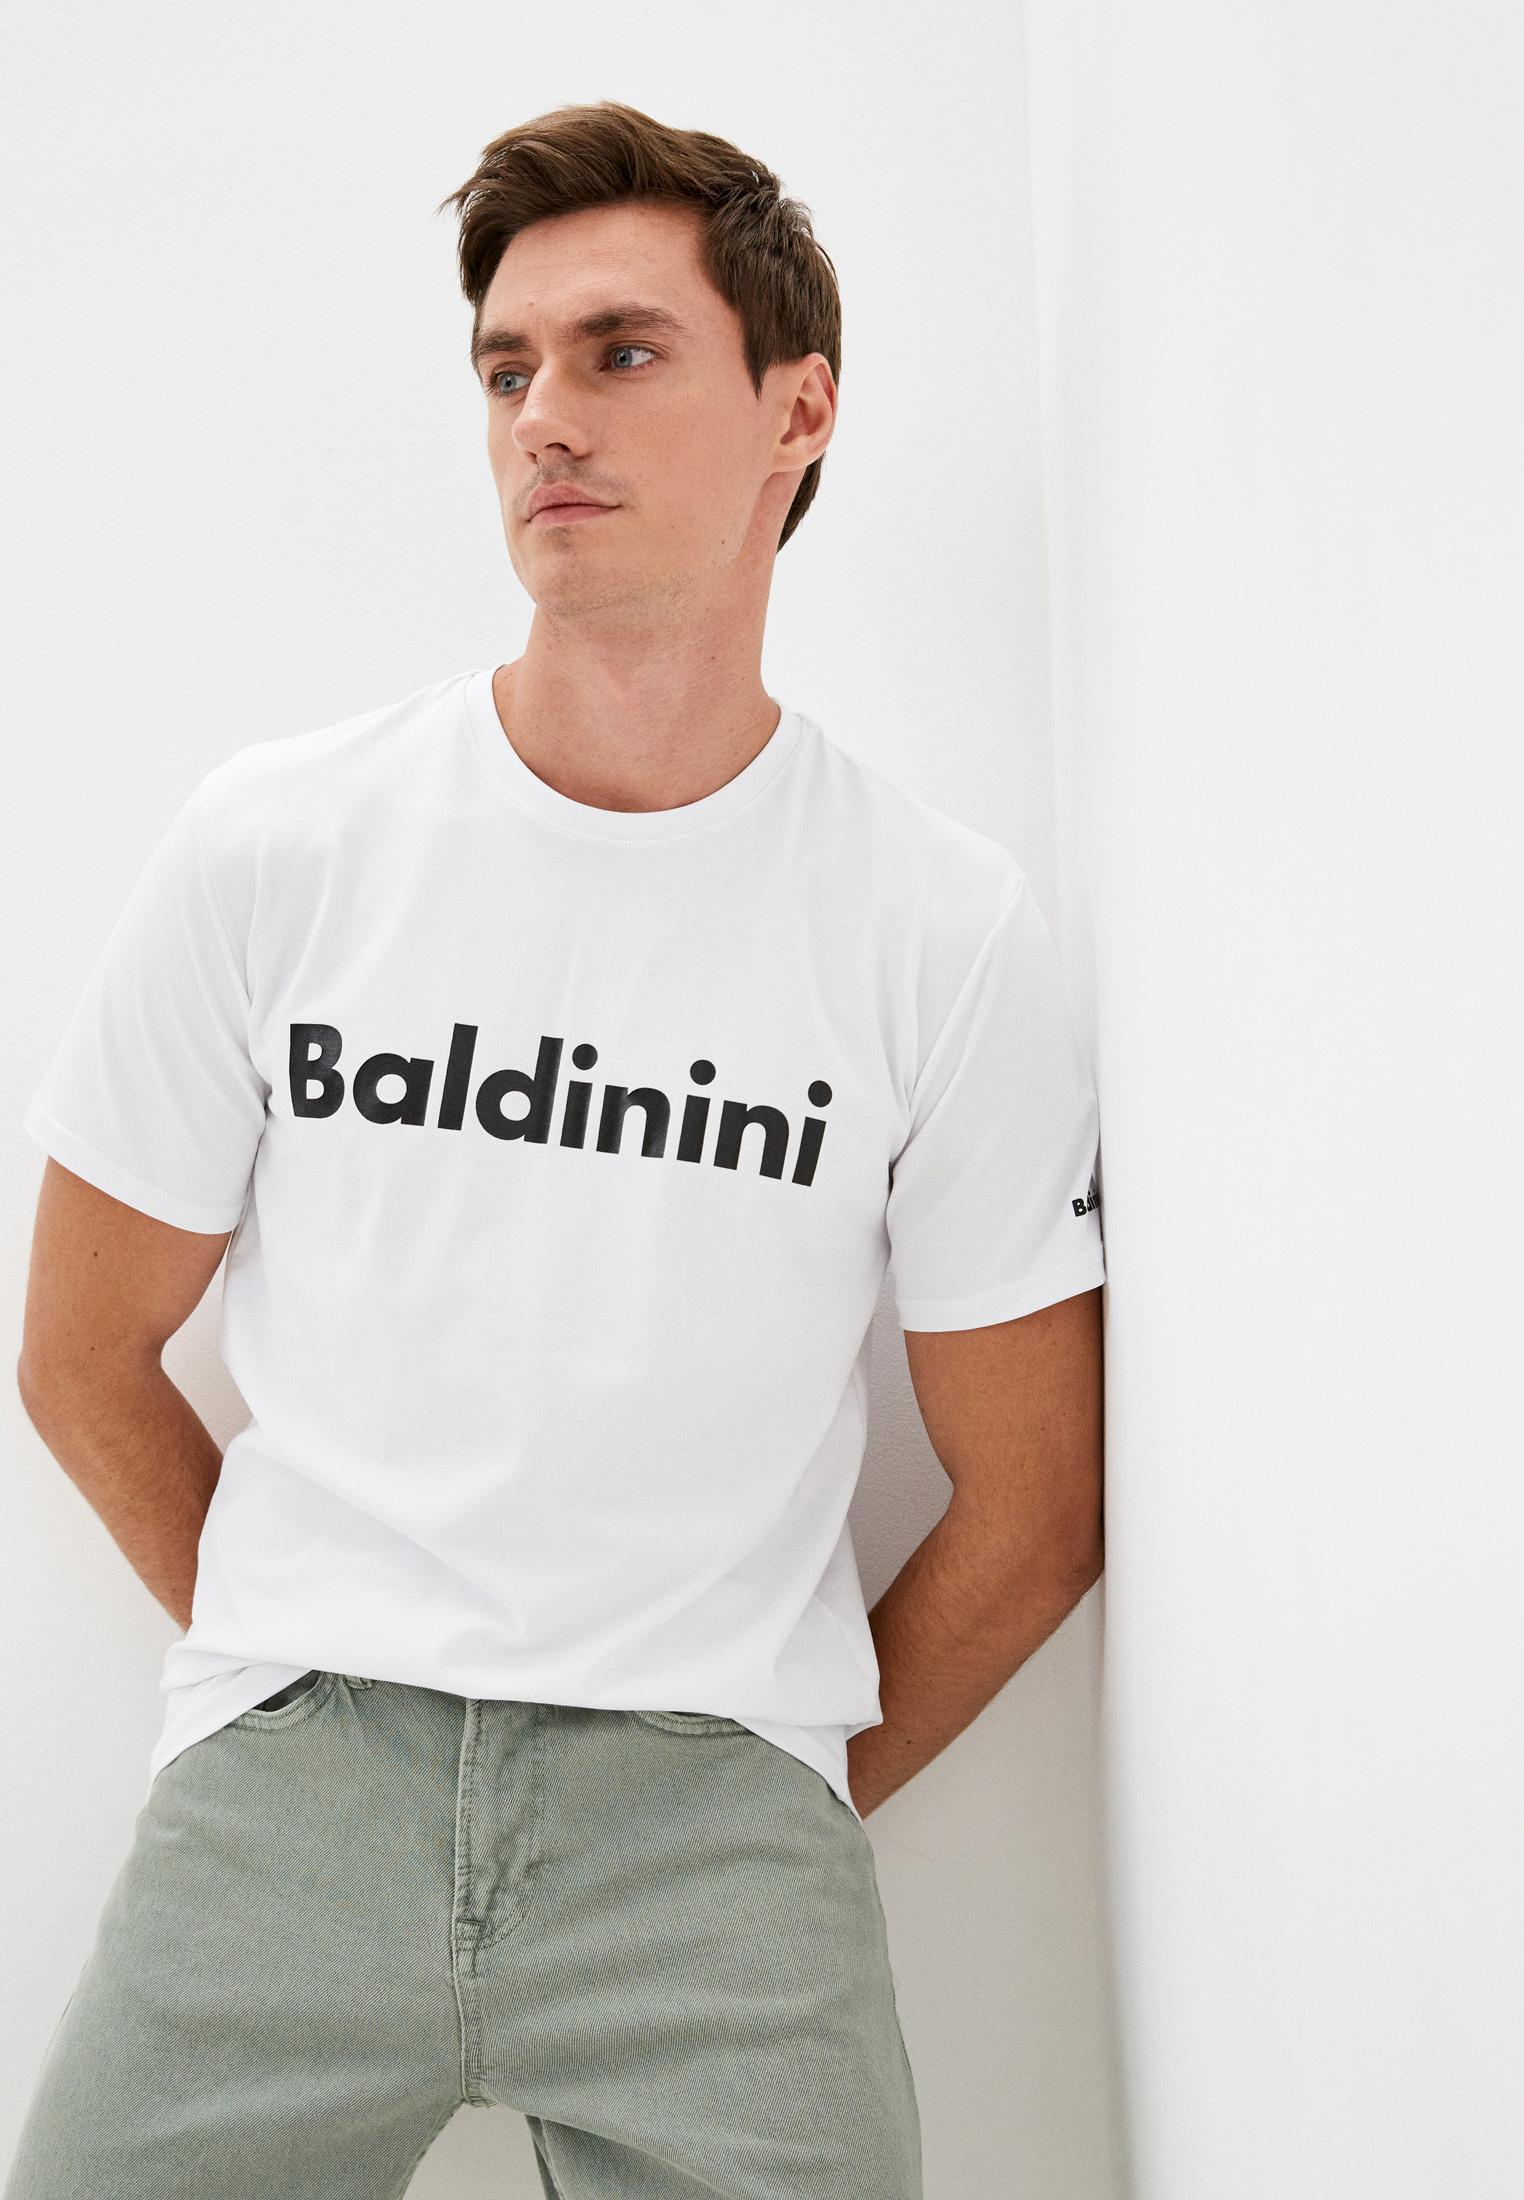 Мужская футболка Baldinini (Балдинини) TSU03: изображение 1